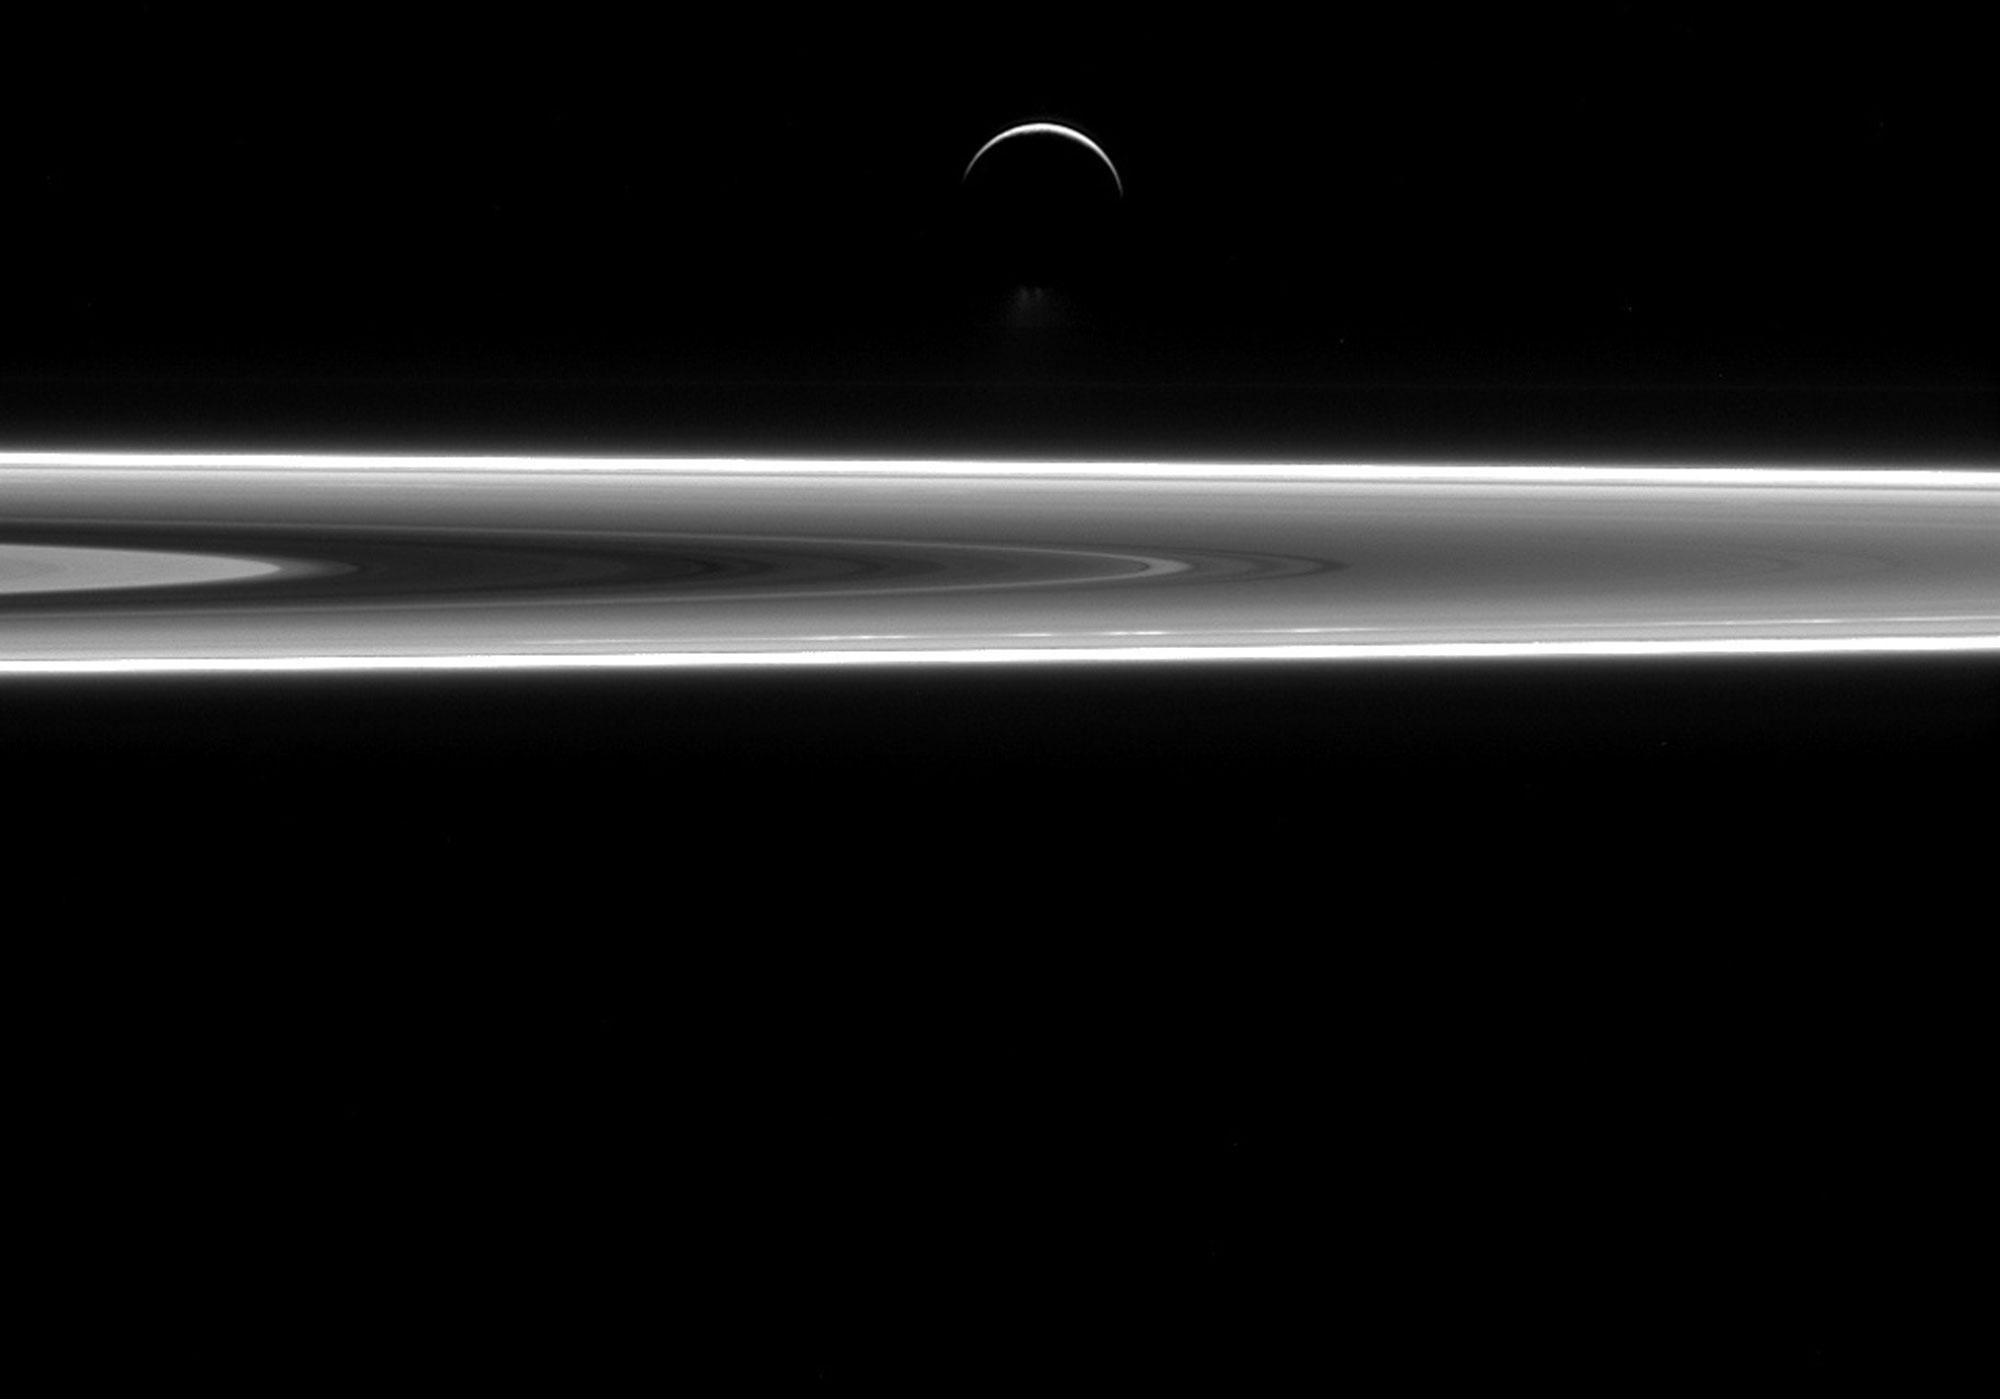 Cassini űrszonda